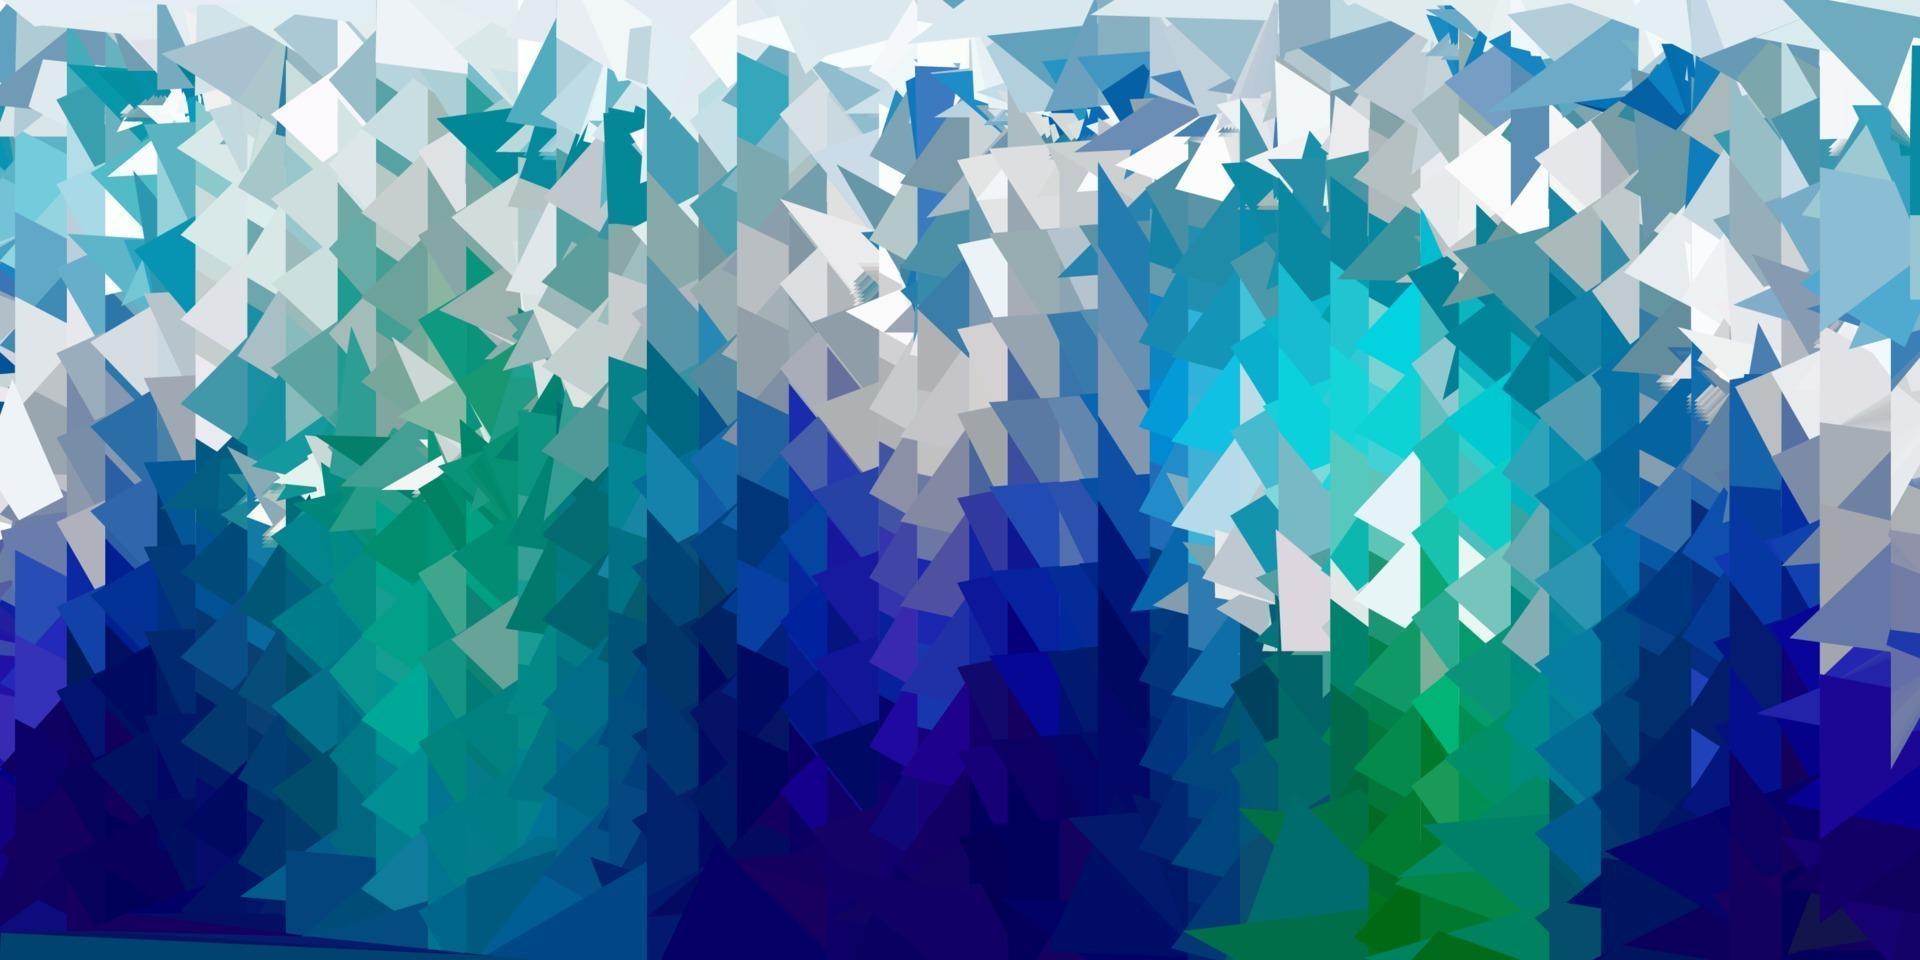 dunkelblaues, grünes Vektorverlaufspolygon-Layout. vektor